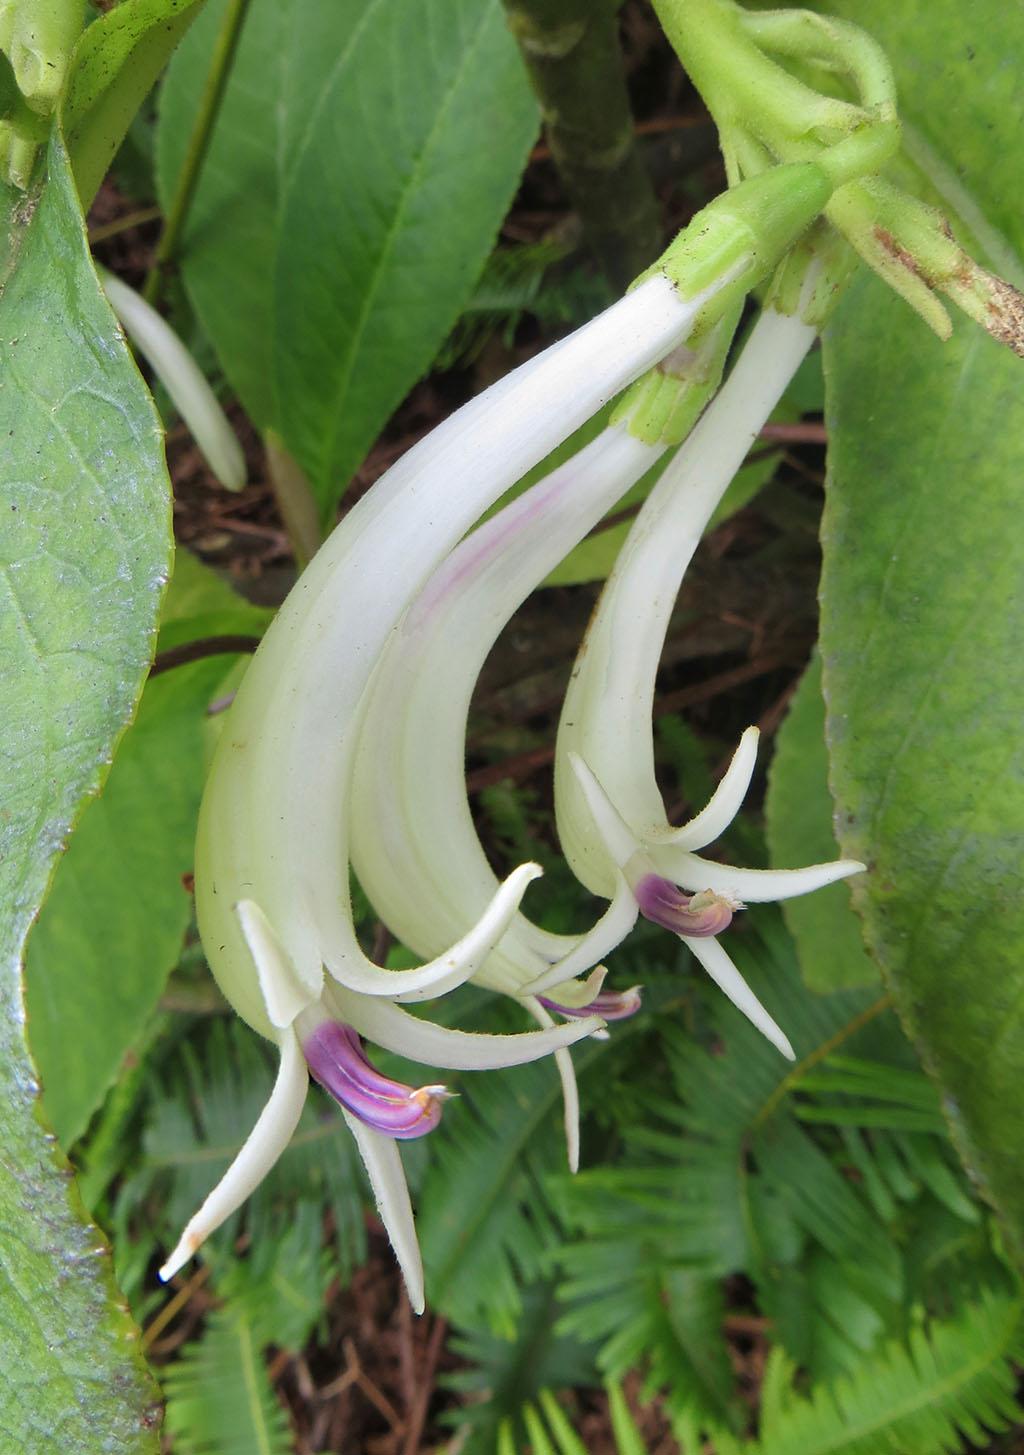 06-Cyanea-humboldtiana-Flowers-Close-2-1024